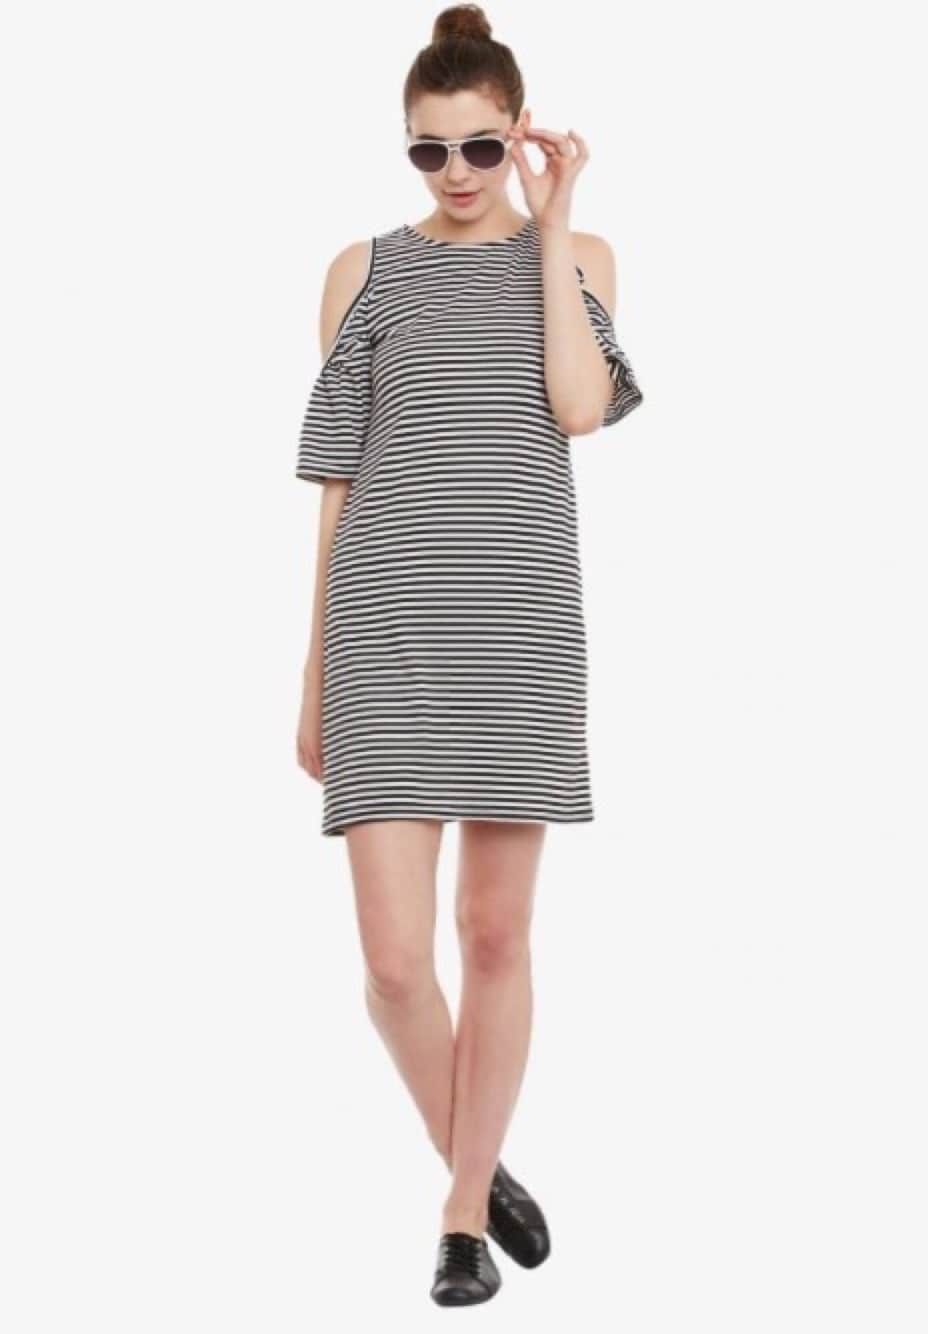 Sale pick of the day                                    Flat 50% off ₹850 only                                       Use Code -- SALEPICK                                       #striped #stripeddress #coldshoulderdress #coldshouldertrend #cold shoulder top sale